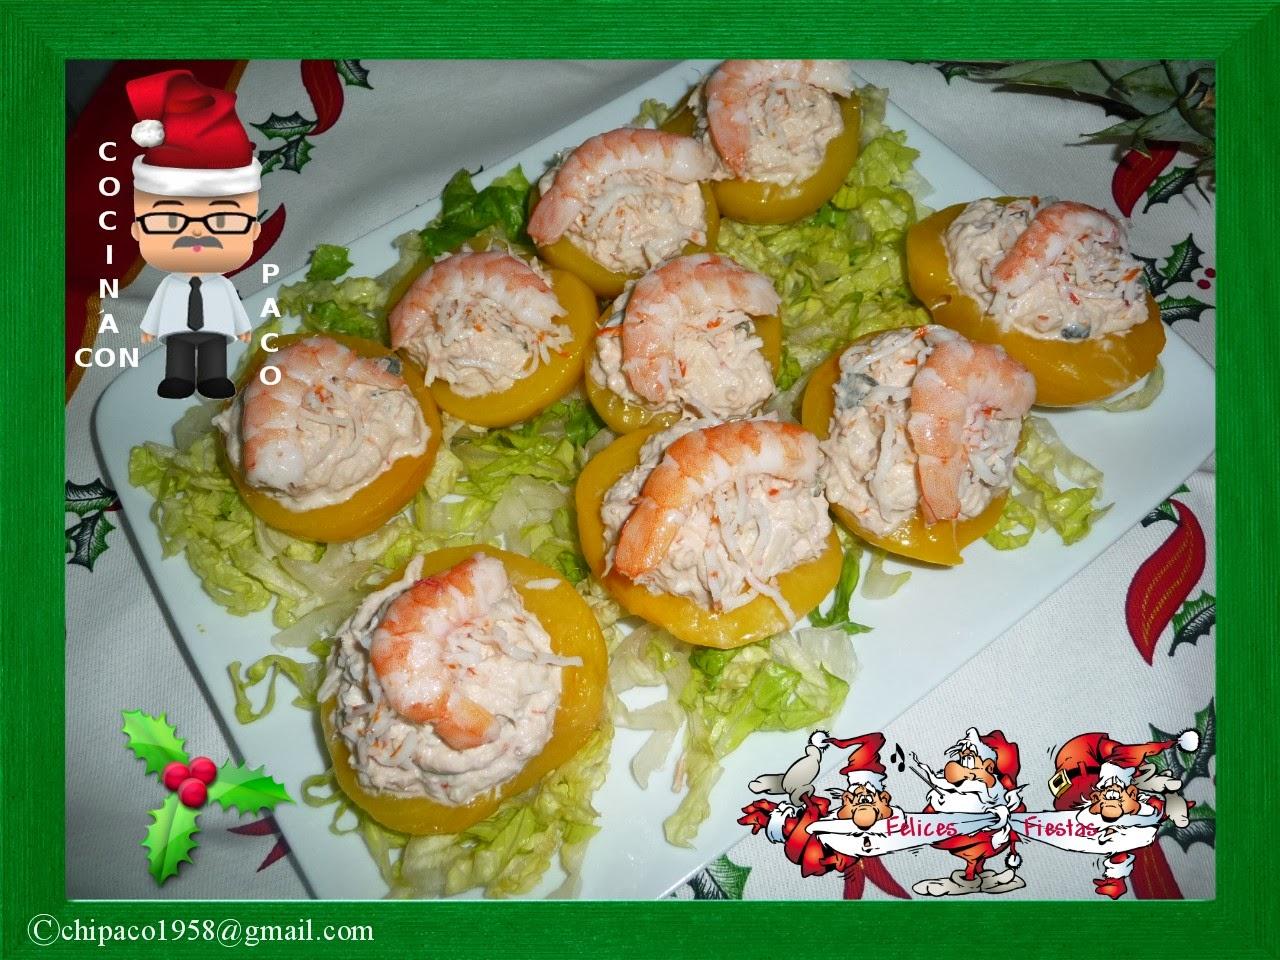 Cocina con paco melocotones en alm bar rellenos - Cocina con paco ...